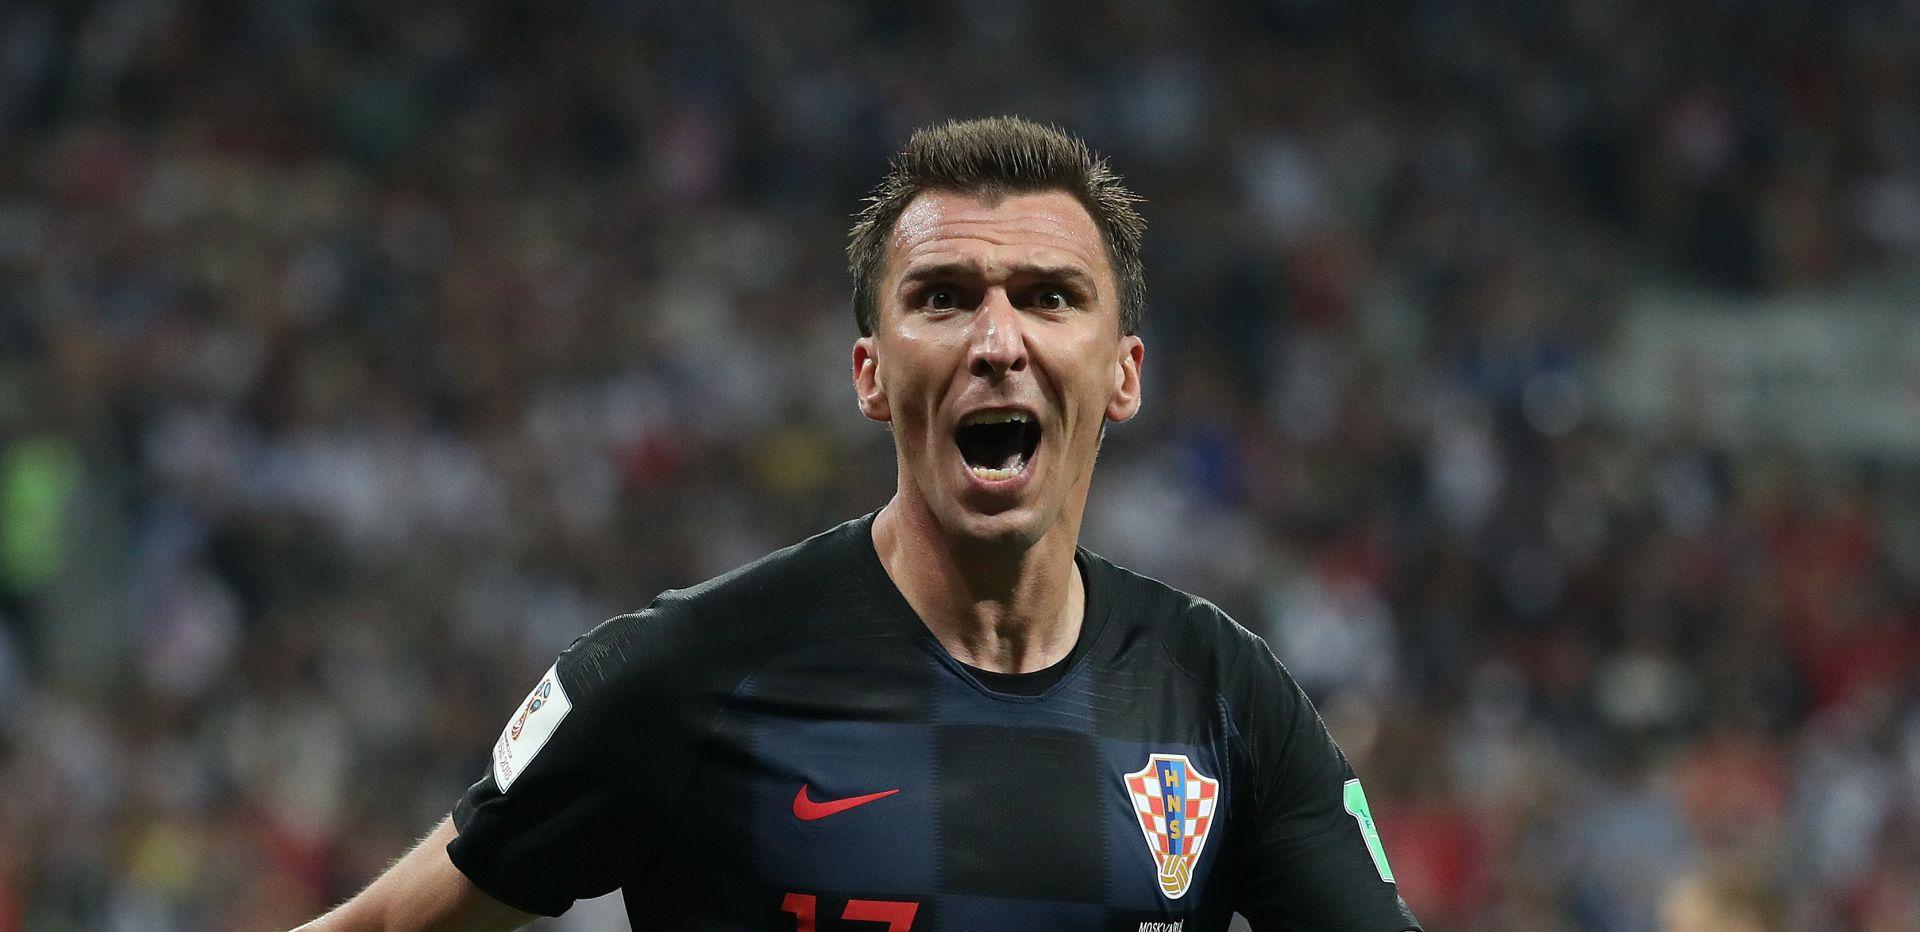 Juventus spreman na trampu Mandžukića za Pogbu?